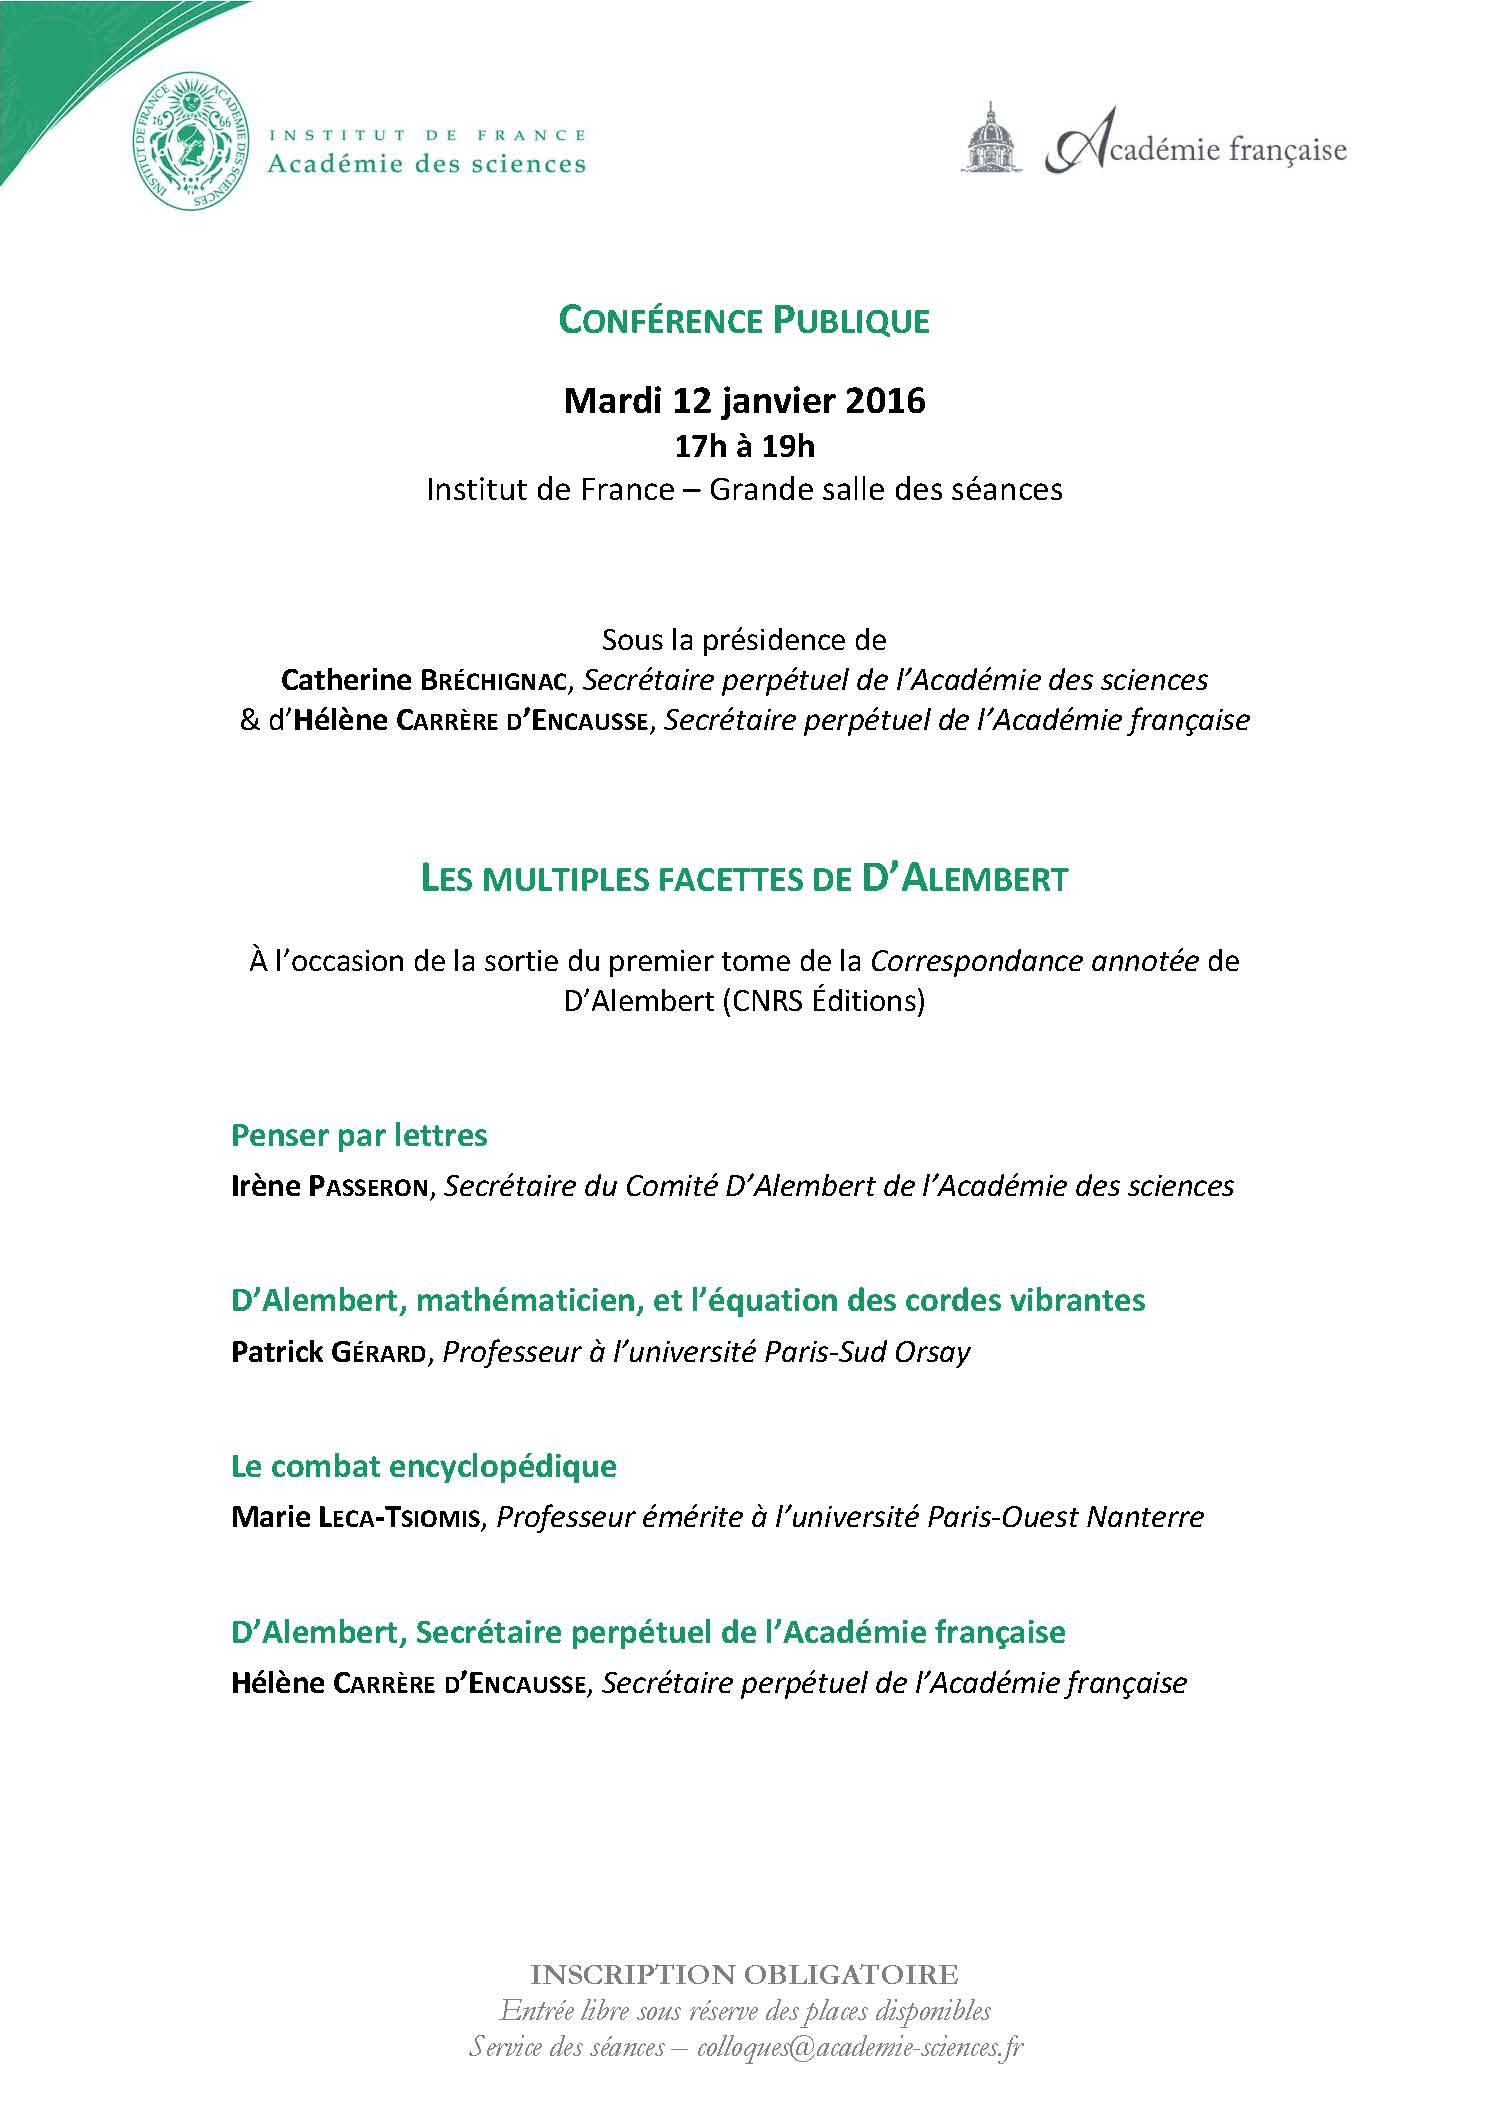 Programme_AdS_Les_multiples_facettes_Dalembert_12-01-2016